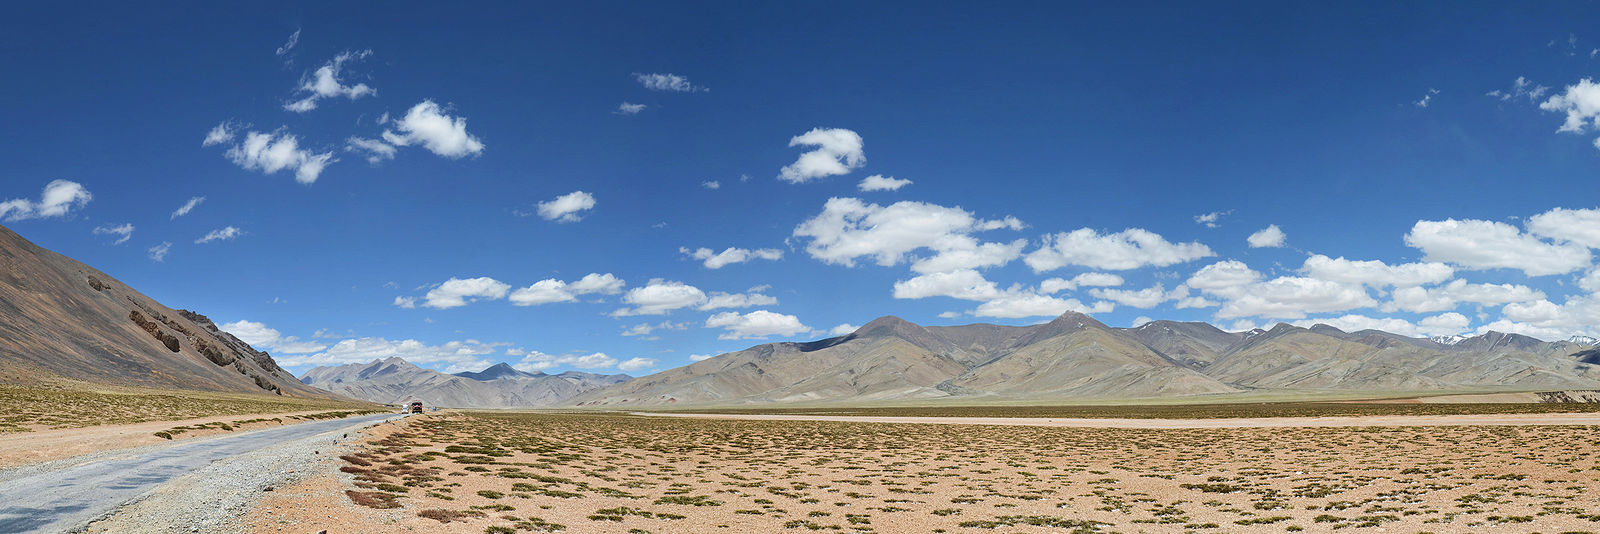 Ivan Aleshin. NH21 and other Himalayan Roads. 0002